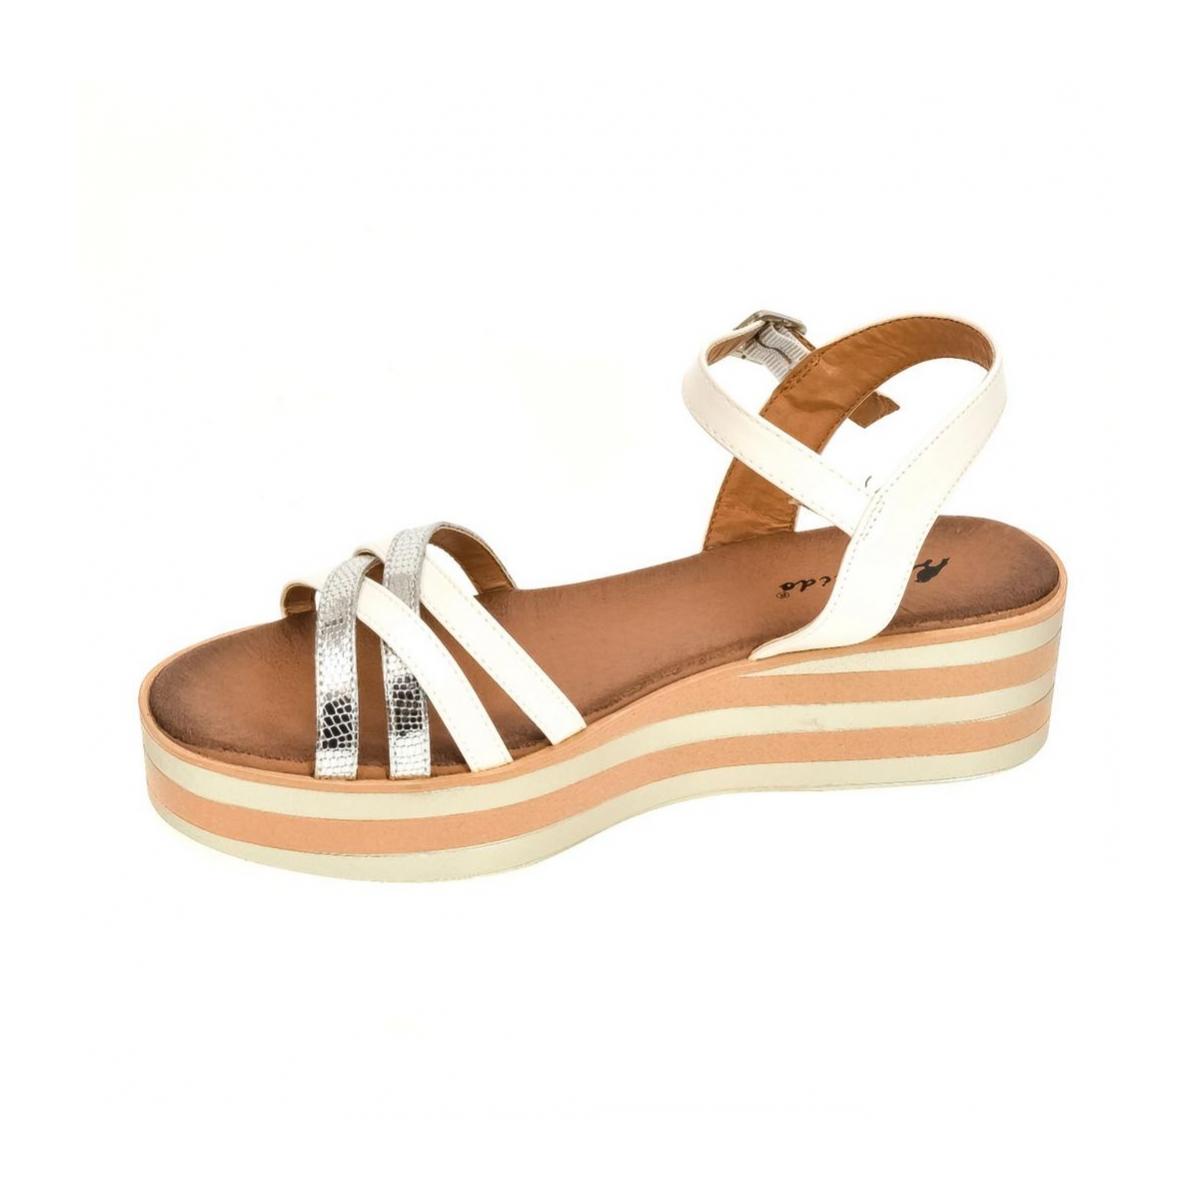 38f4addad391 Dámske strieborné sandále SAVIN